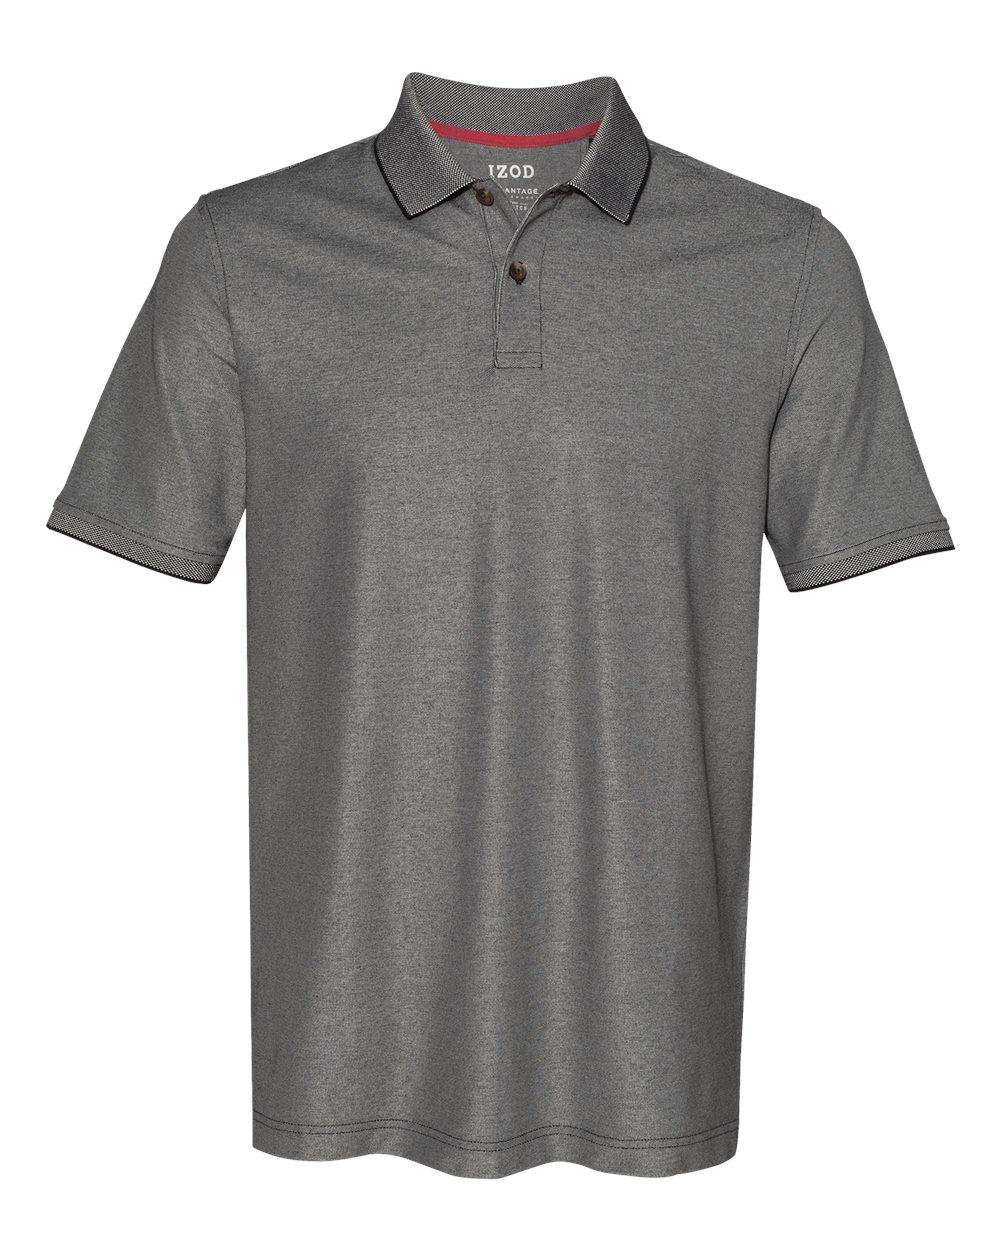 Advantage Performance Sport Shirt